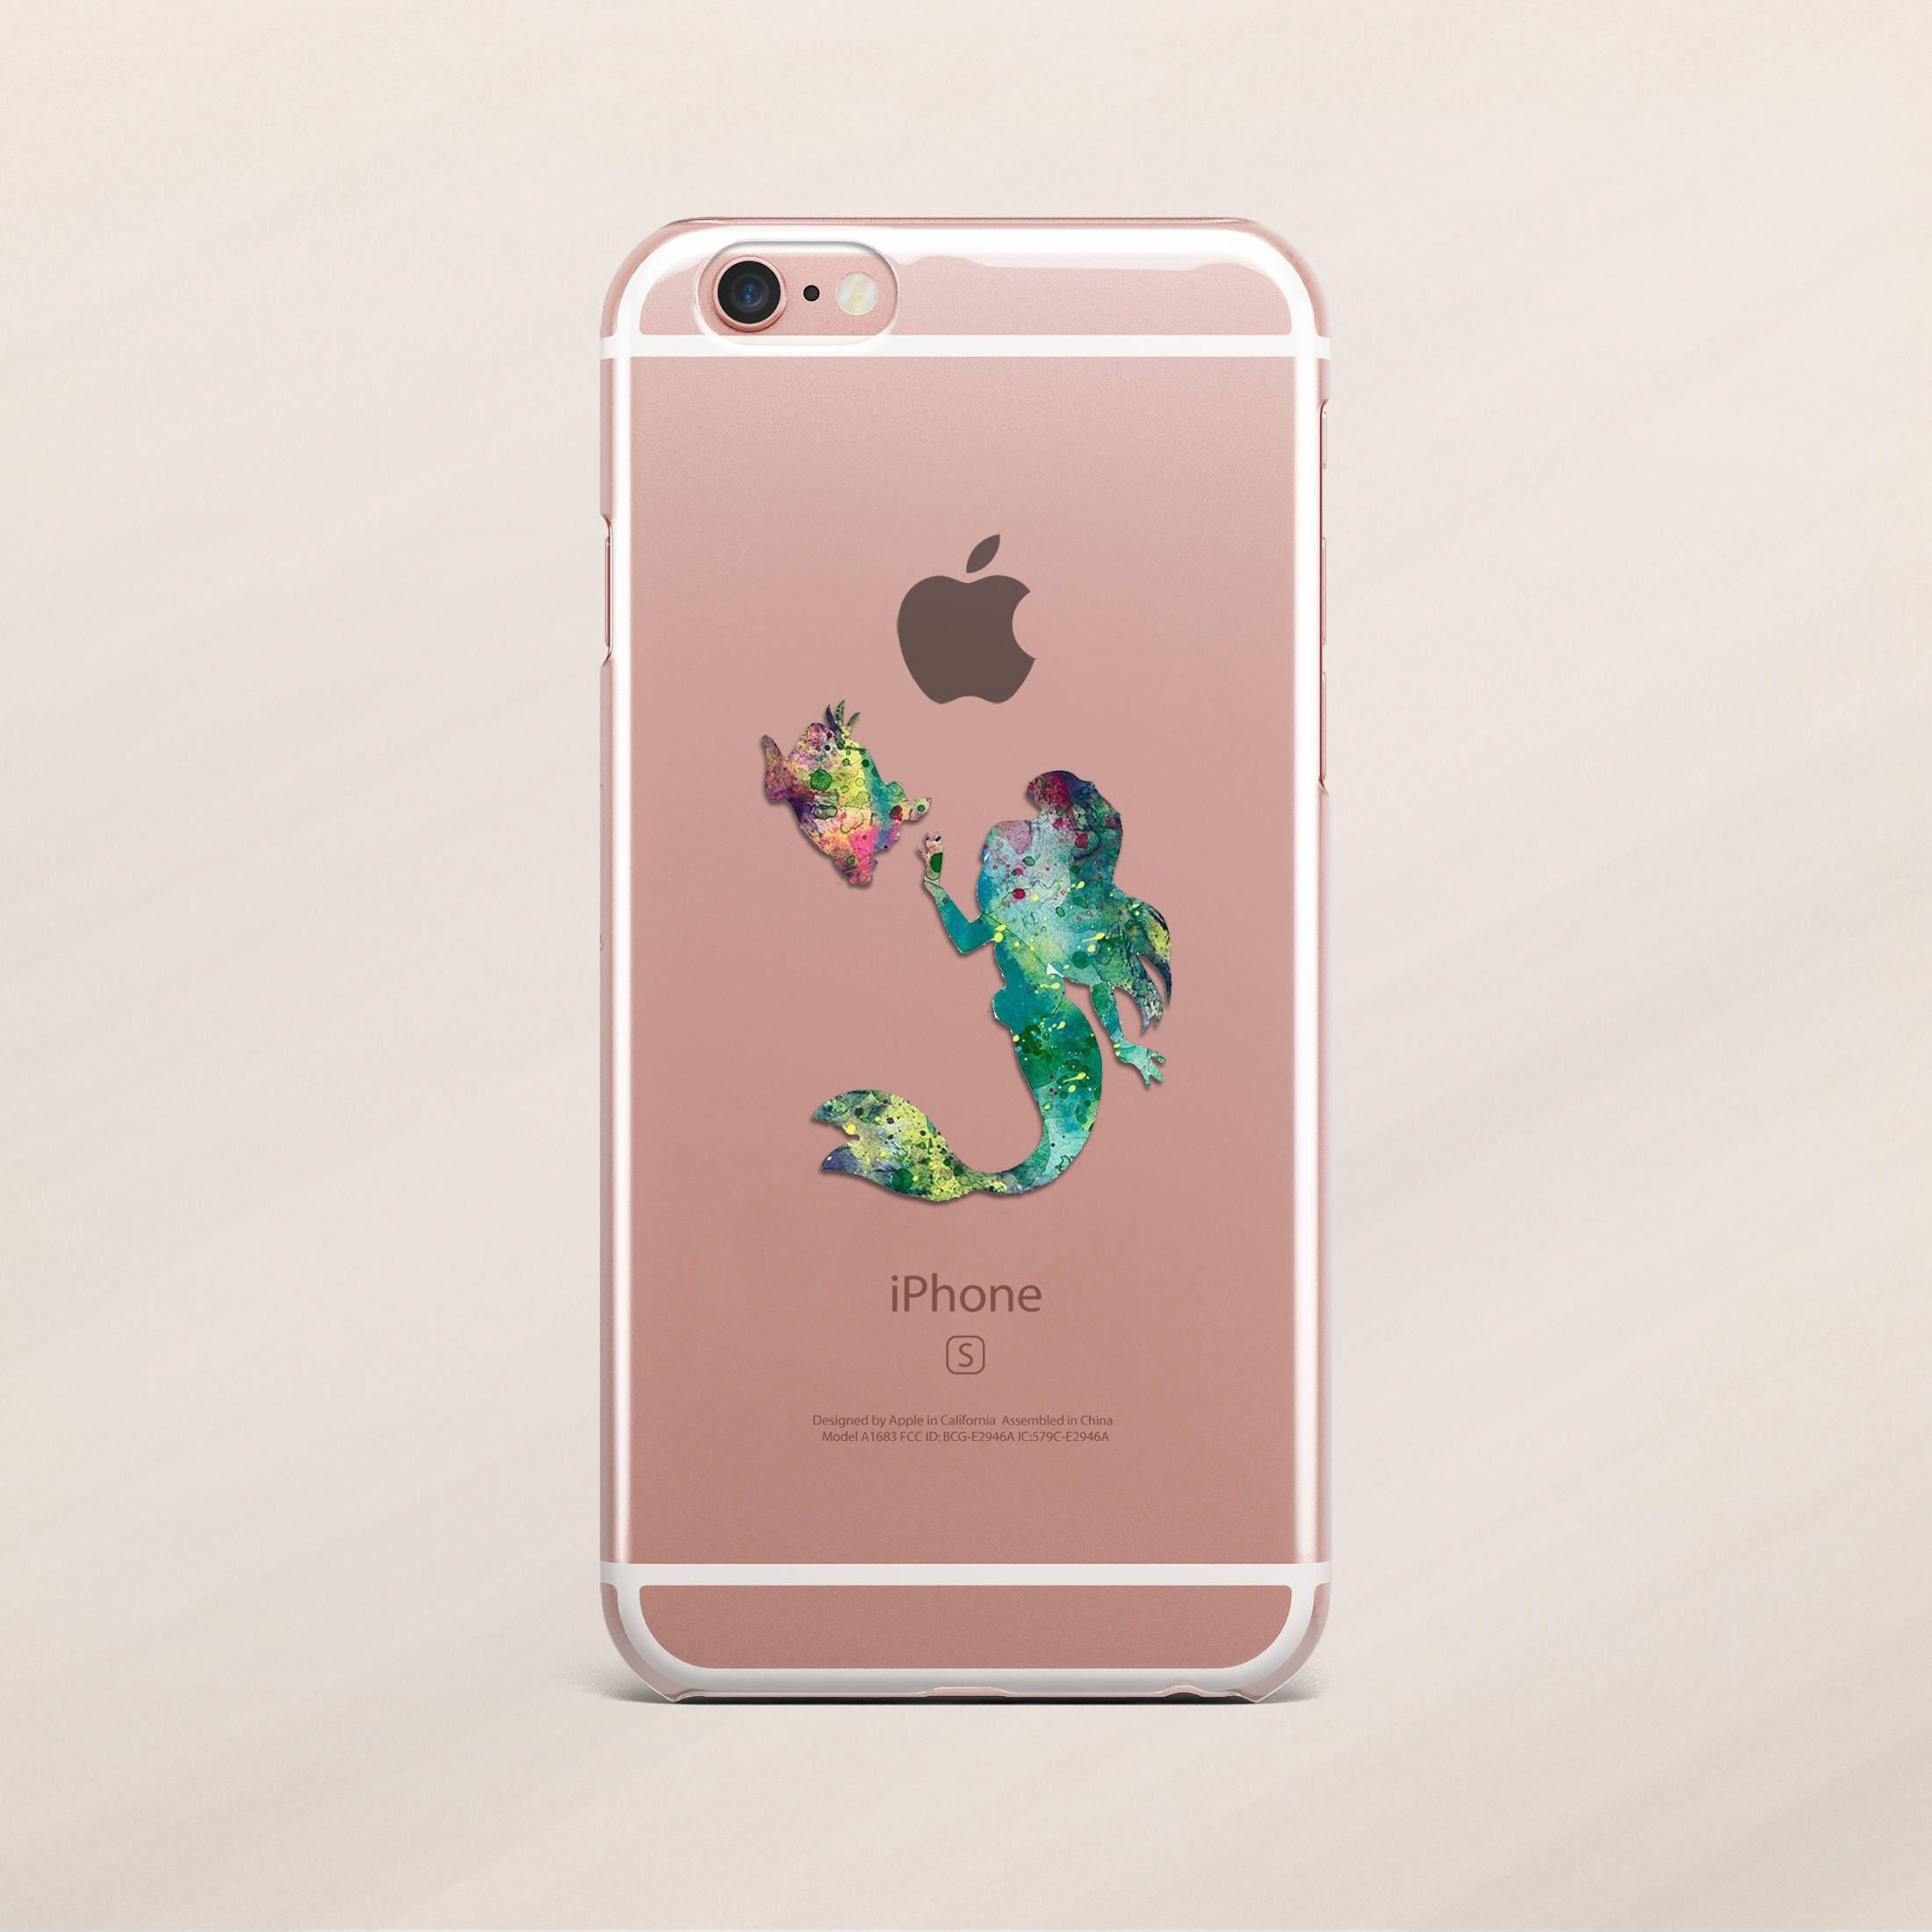 iphone 6 disney phone case